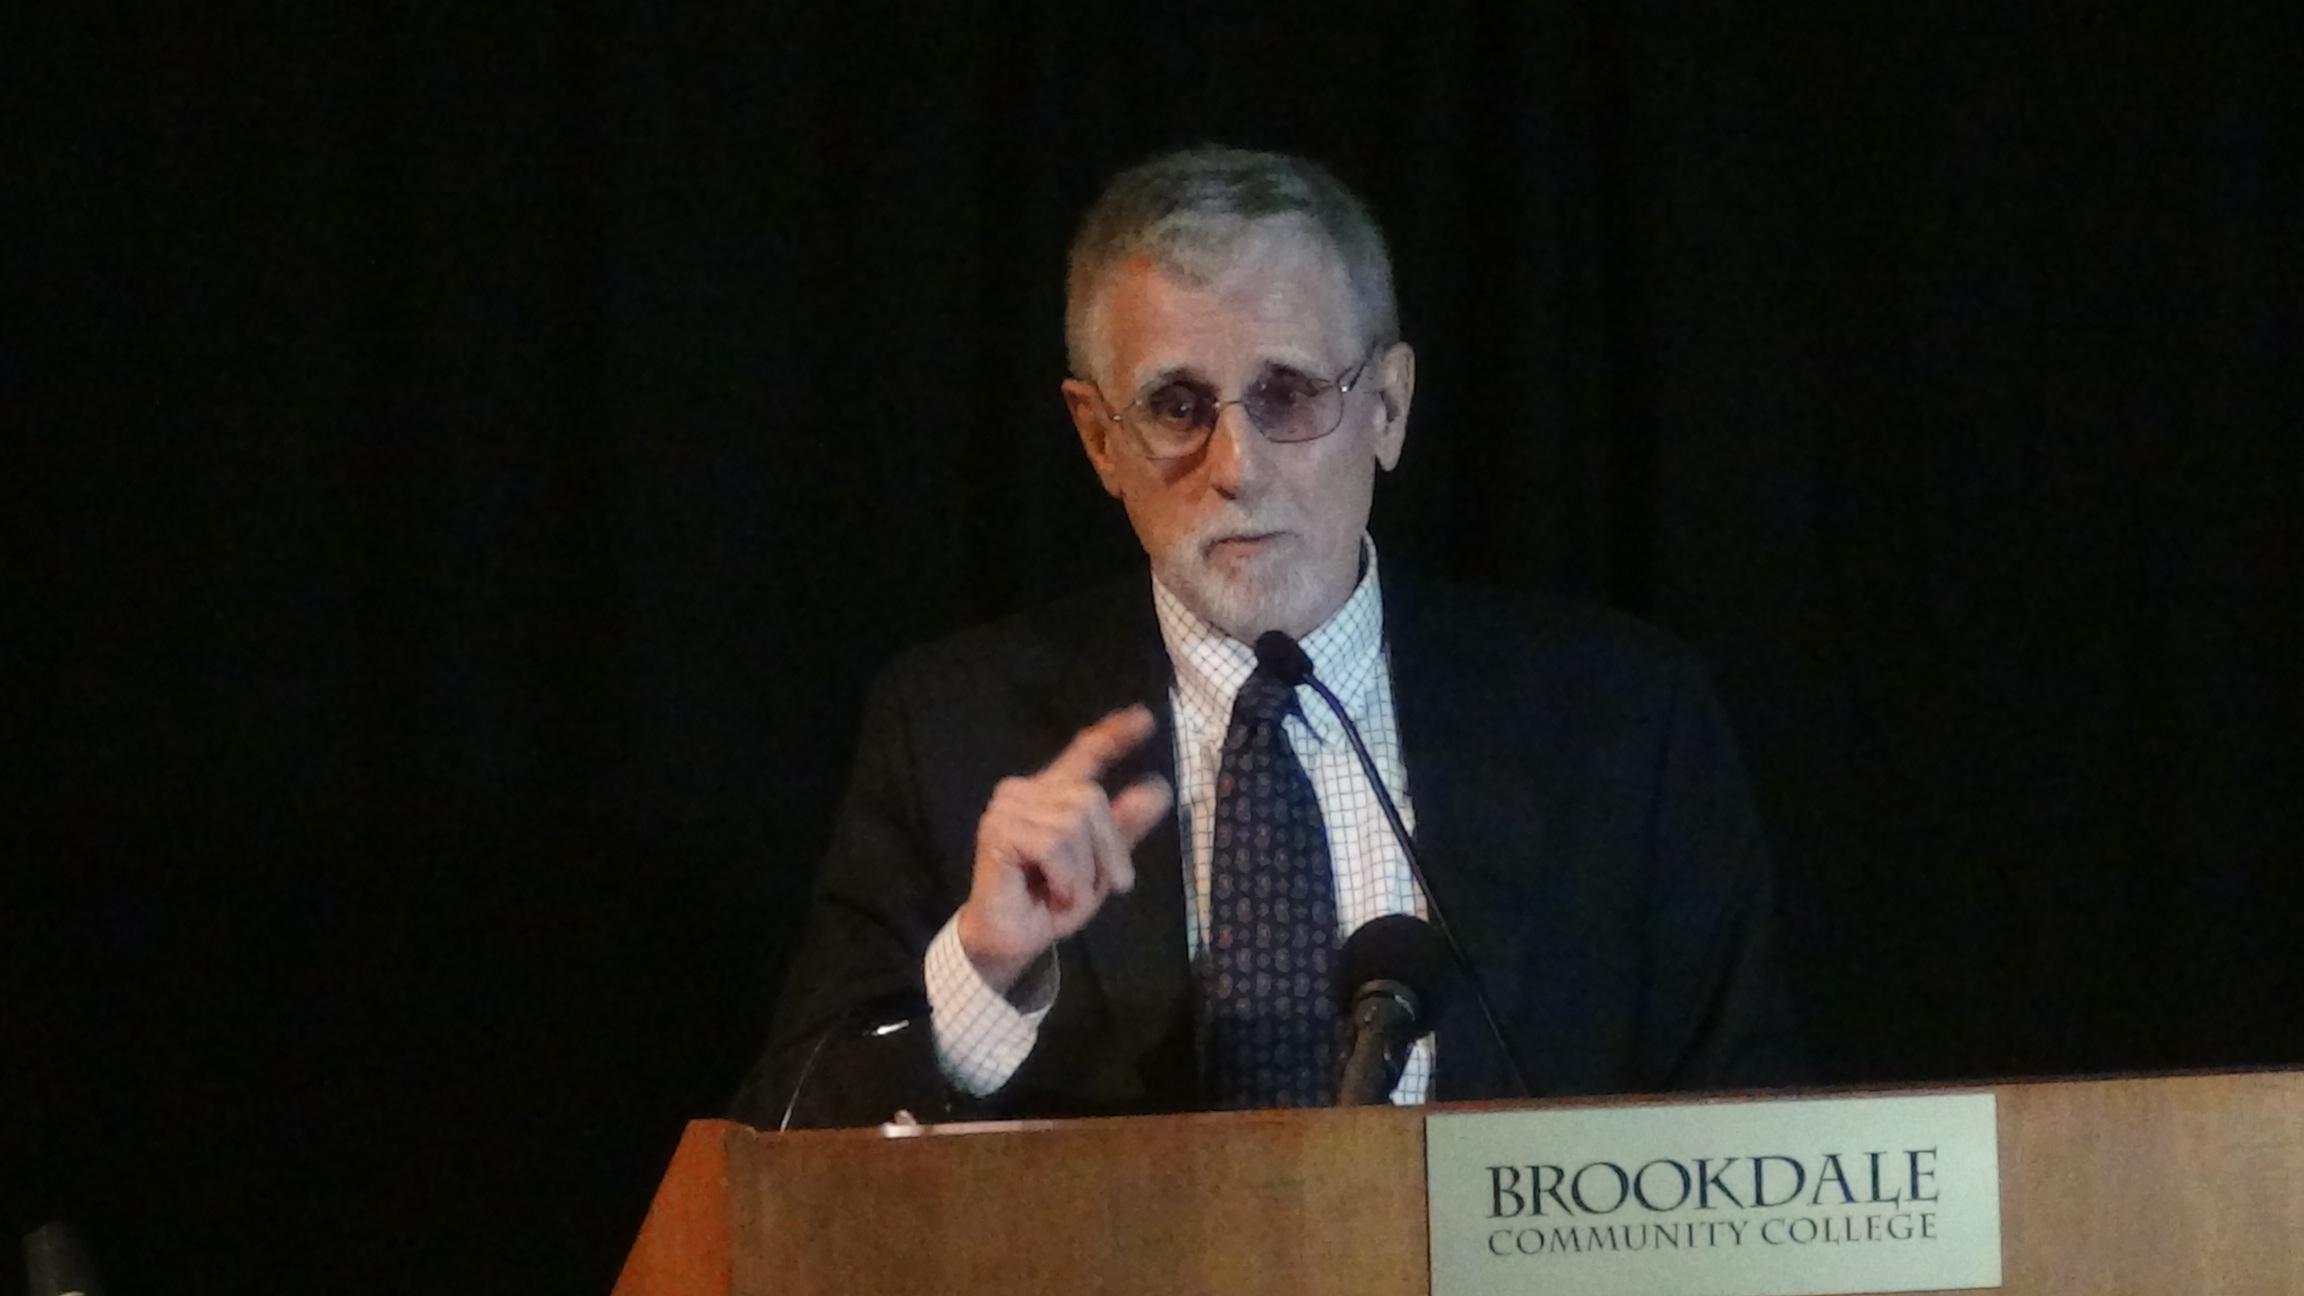 Paul Kobran